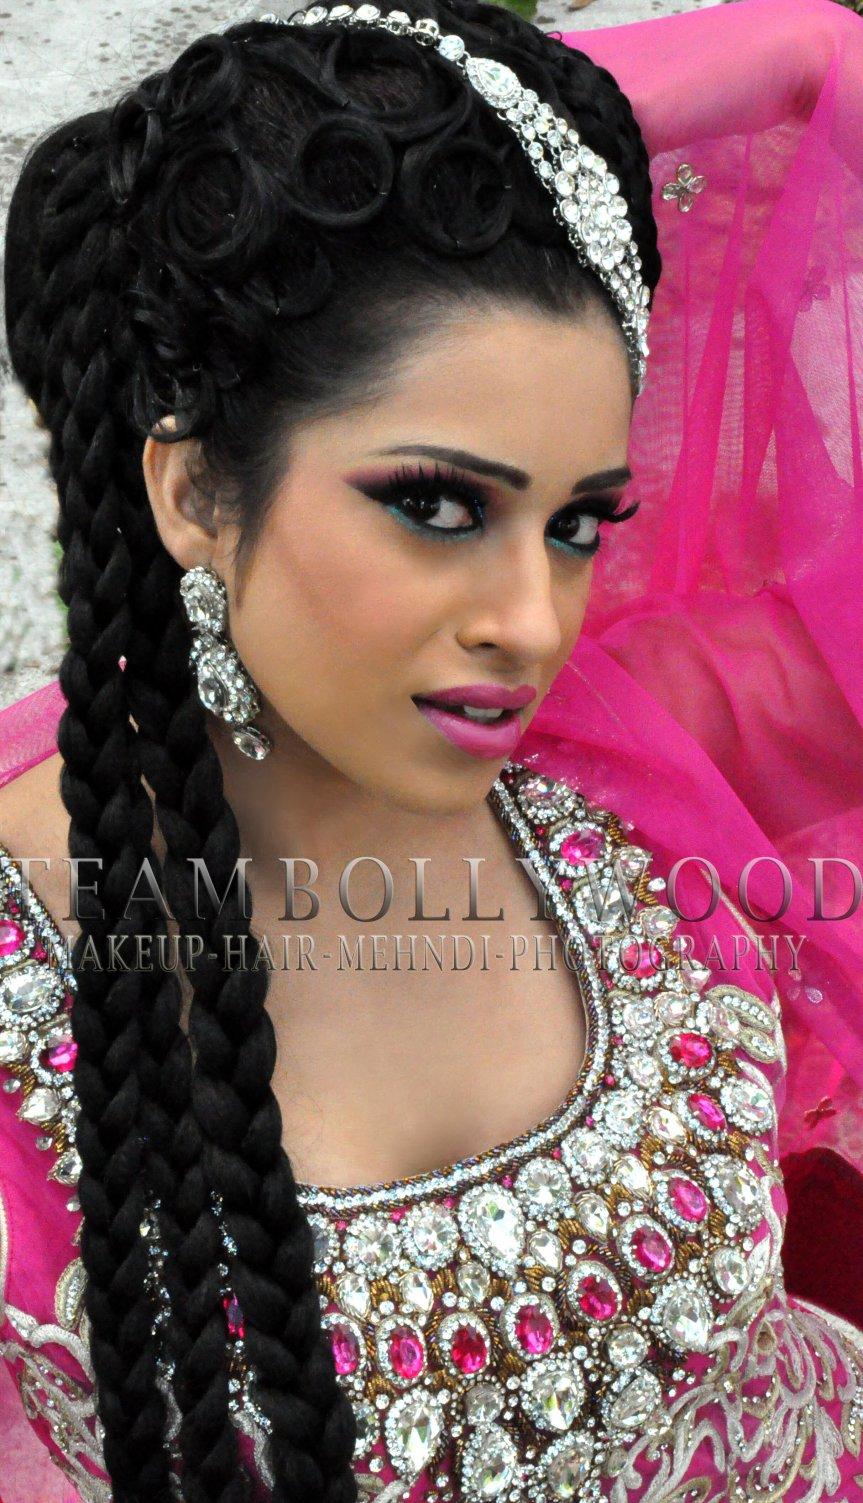 Fotoshoot Sadhana Lila met Bollywood MUA, Dress4Impress & Syed's Studio tijdens 'Eid Festival' op Afrikaanderplein, Rotterdam